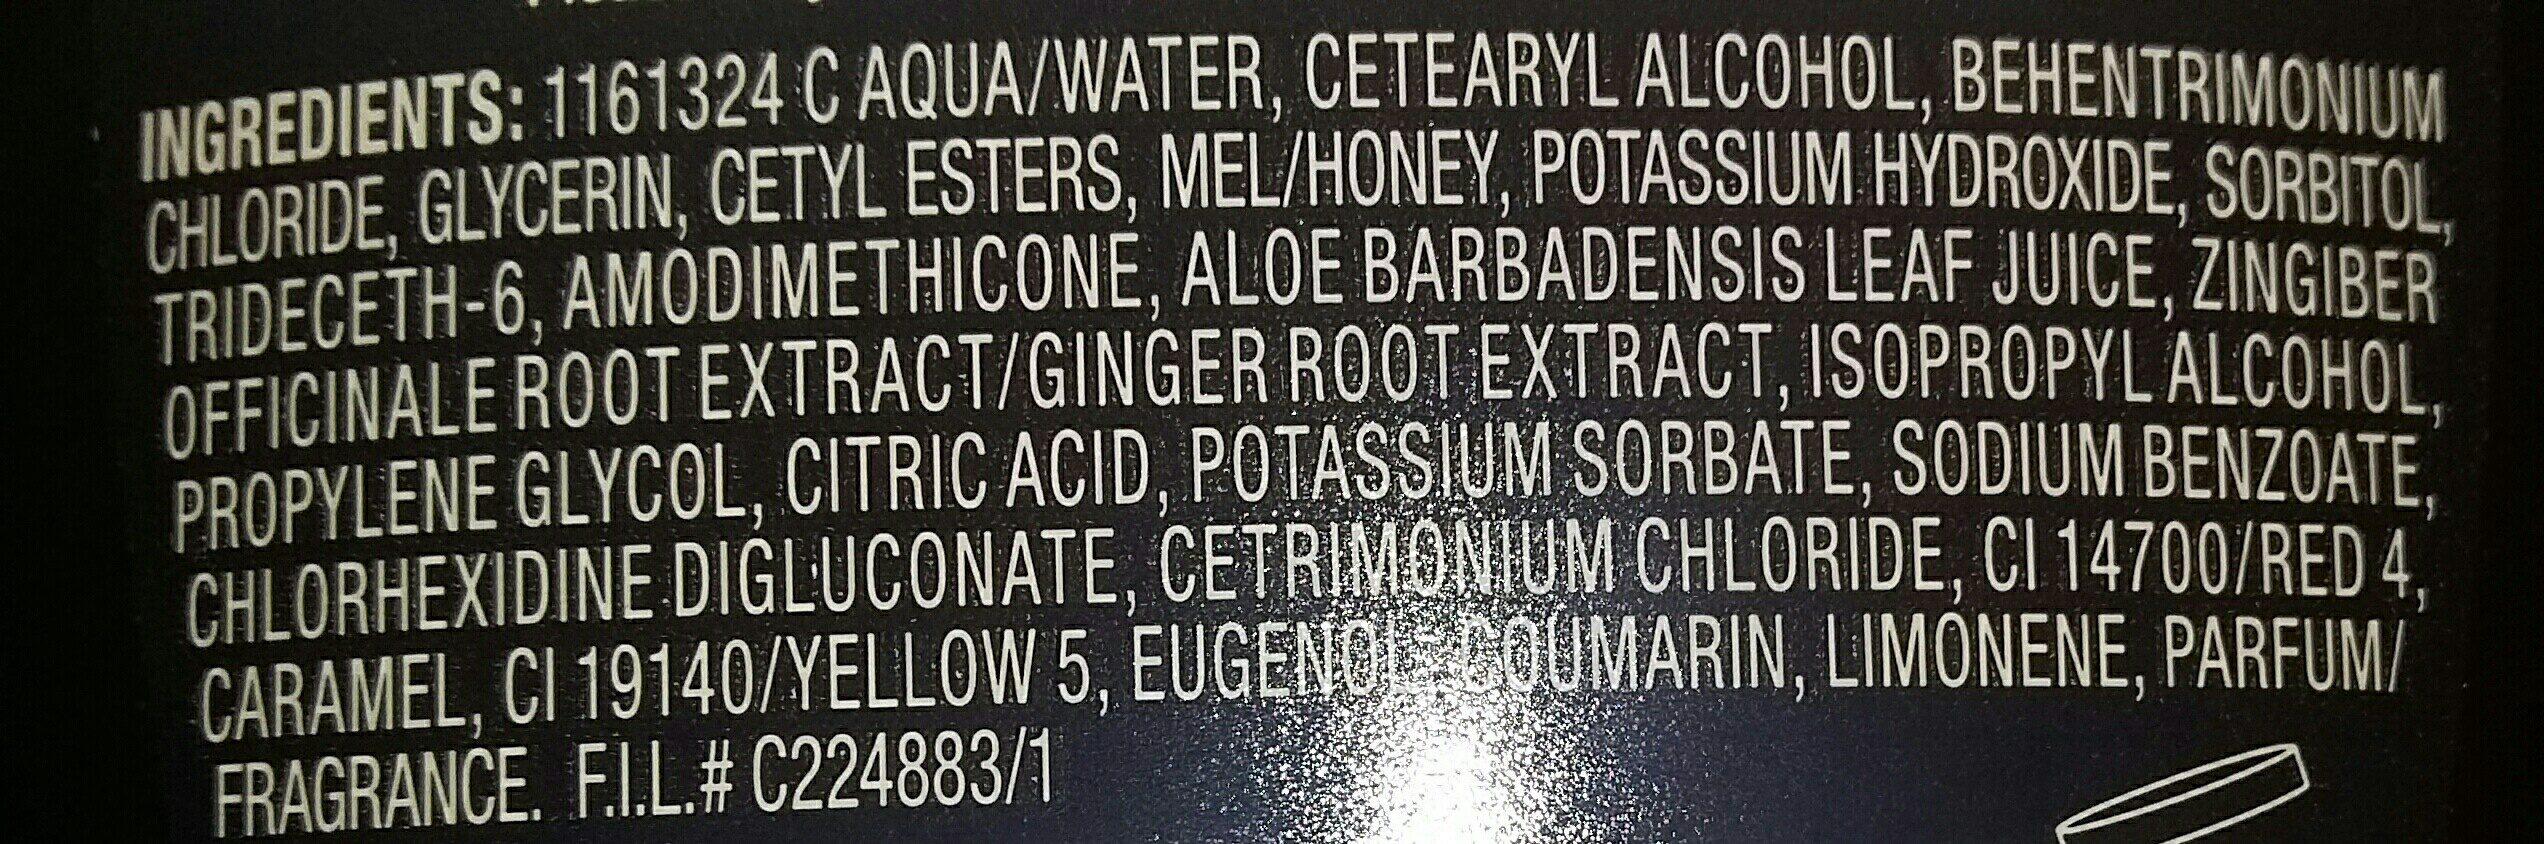 Garnier whole blend - Ingredients - en